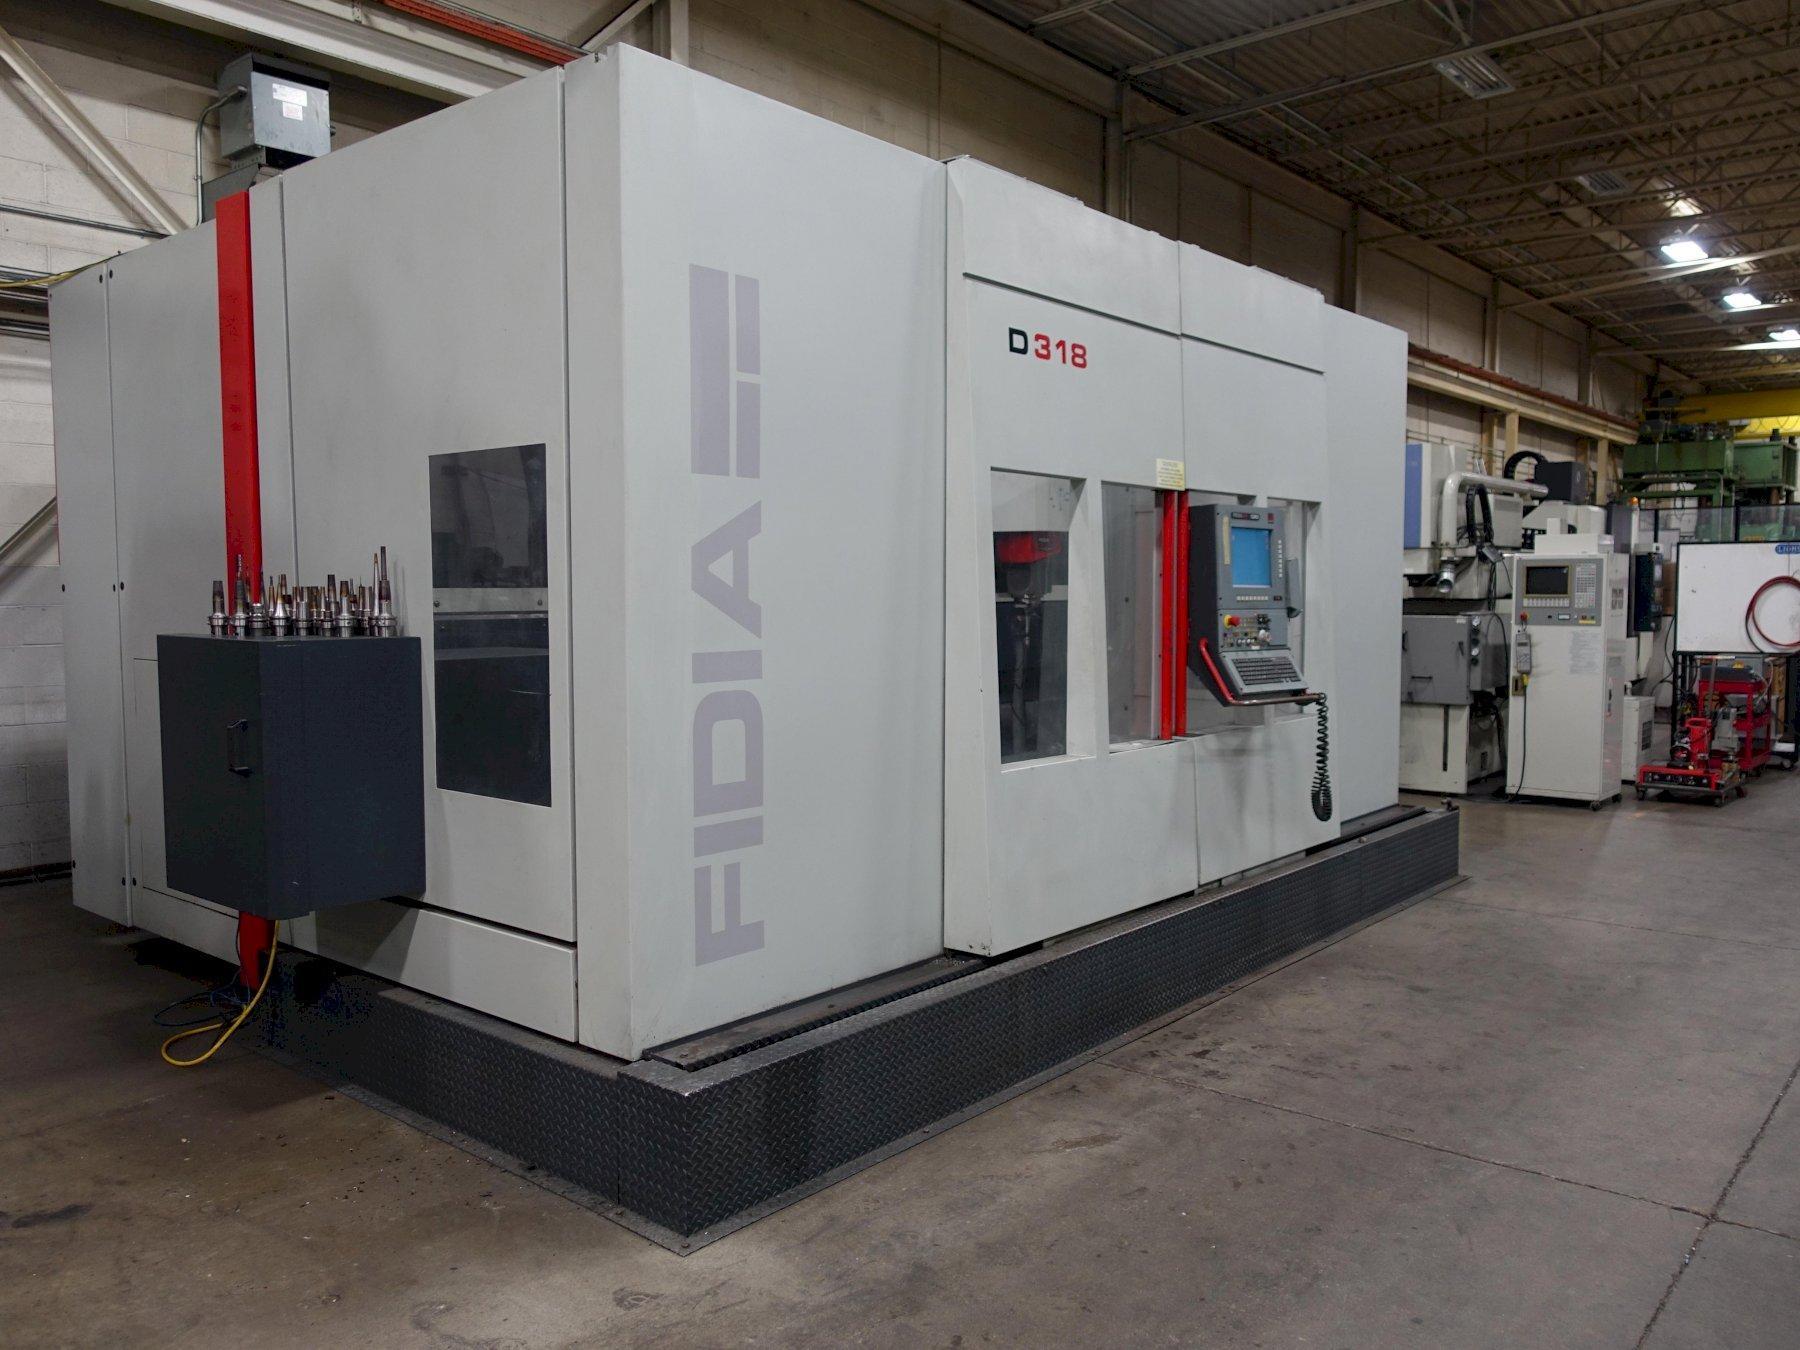 FIDIA D318 CNC VMC